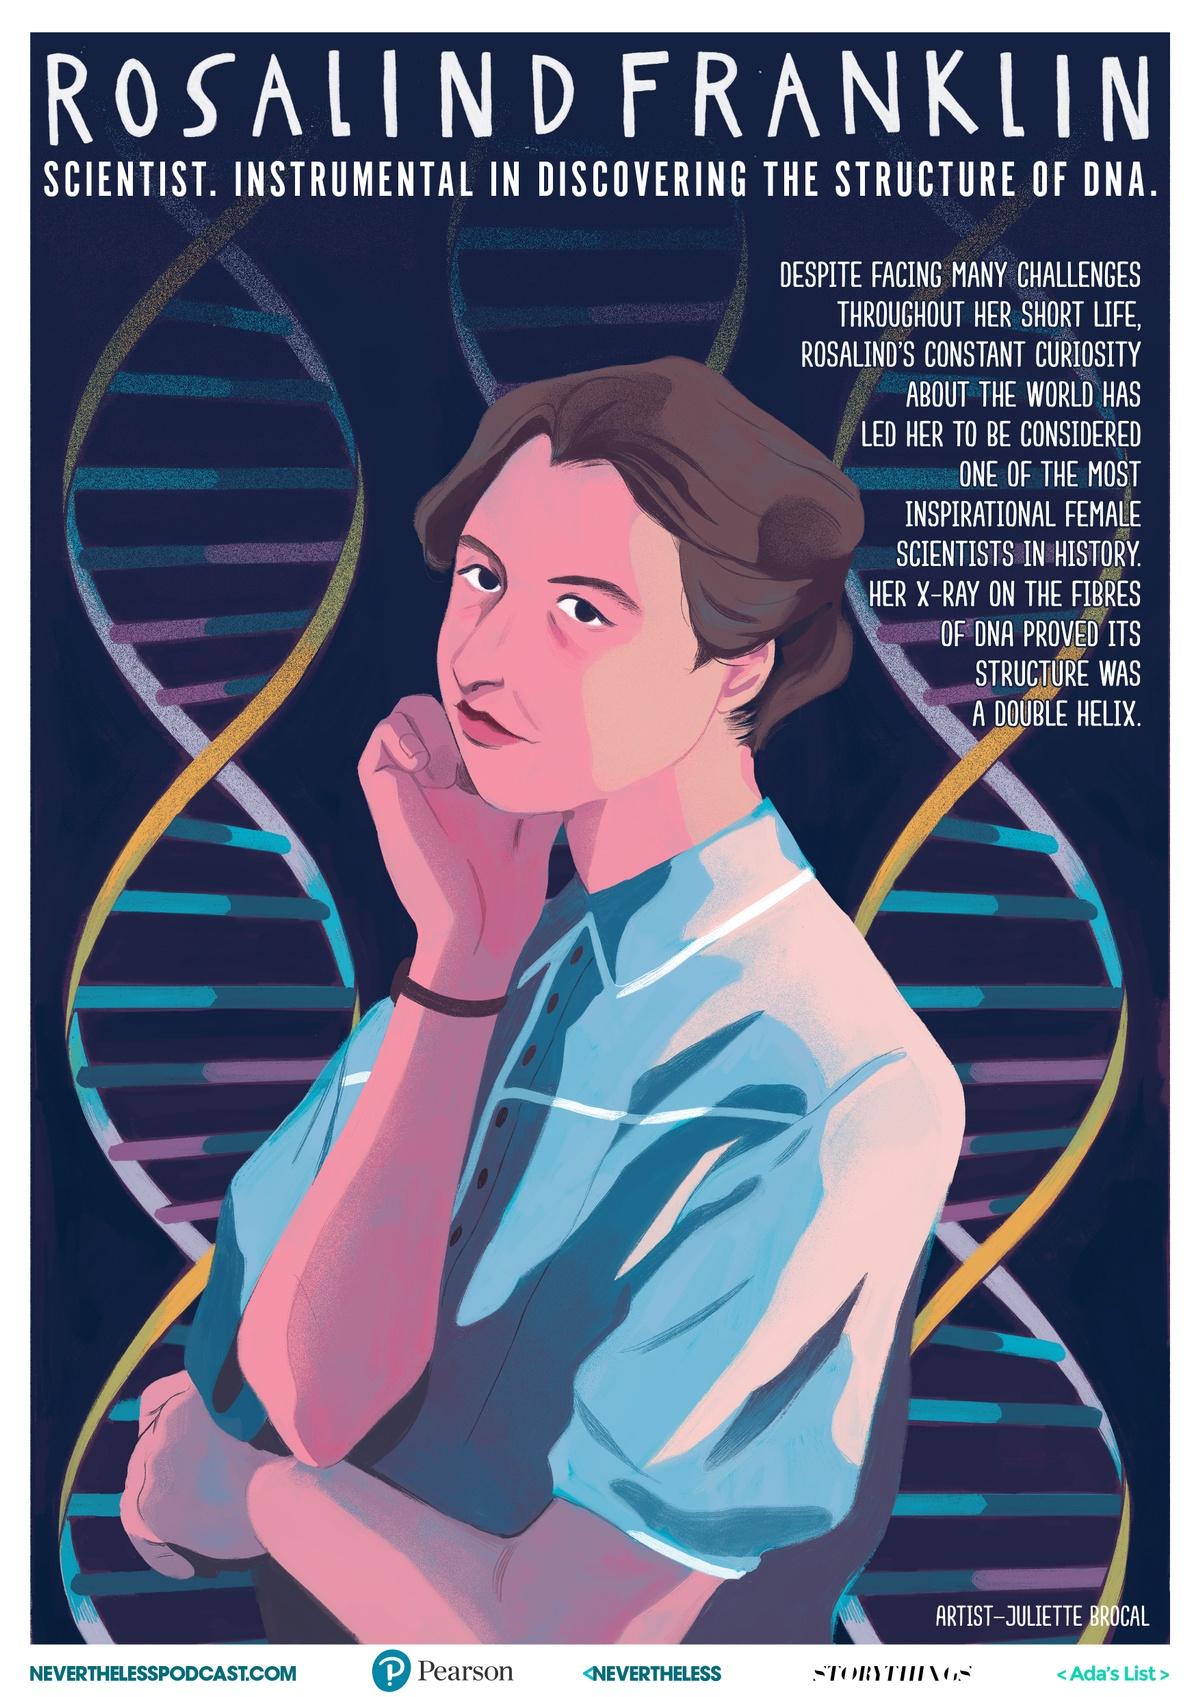 illustrated poster of Rosalind Franklin by Juliette Brocal